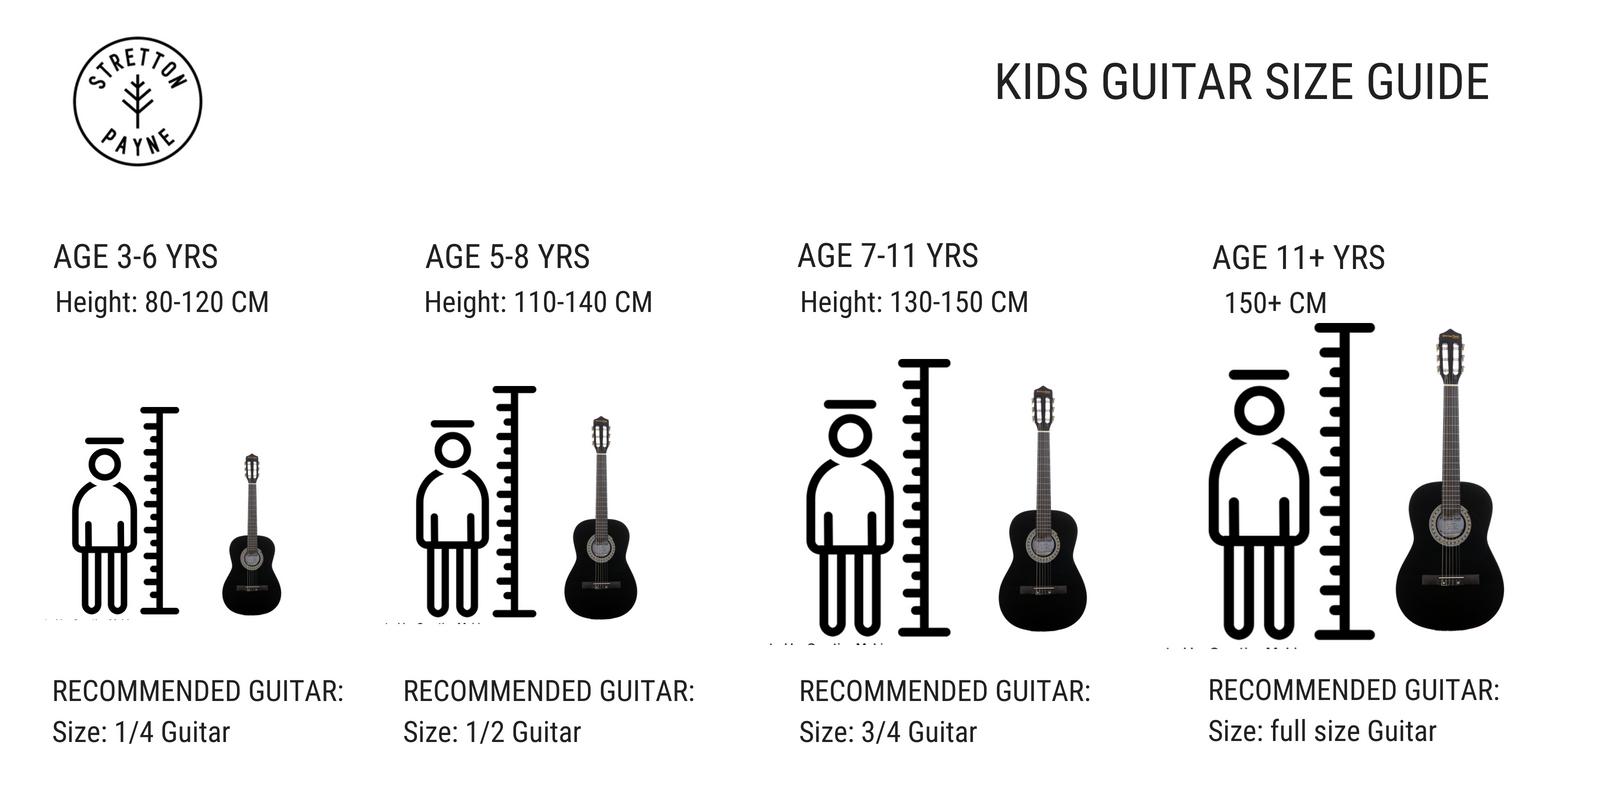 kids-guitar-size-guide-stretton-payne.jpg